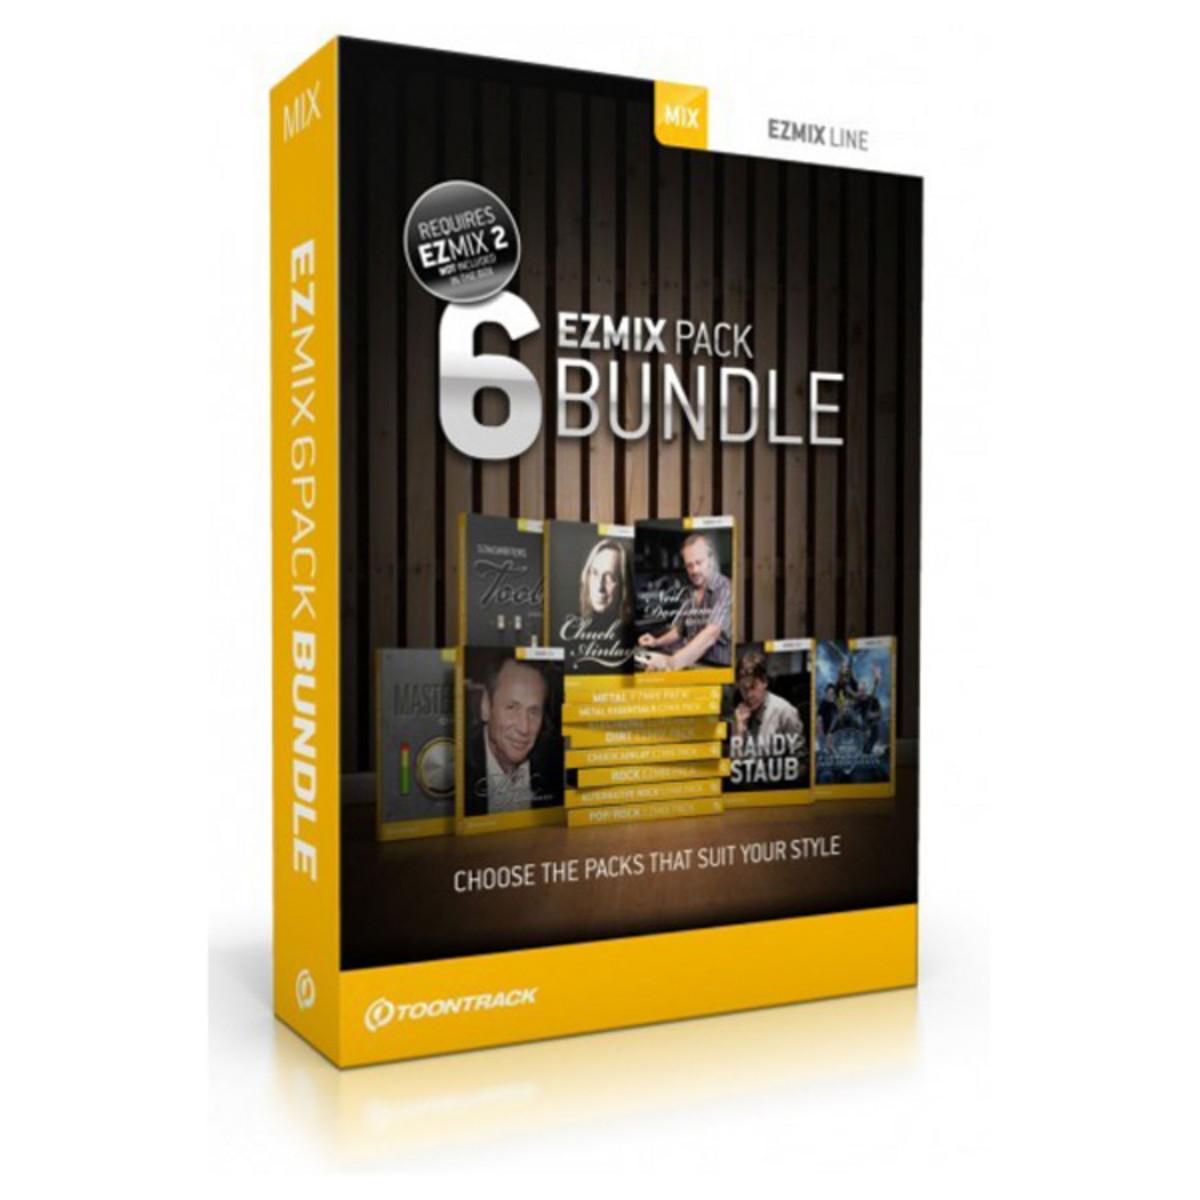 Toontrack EZmix Presets Bundle for EZMix 2 Mixing Software